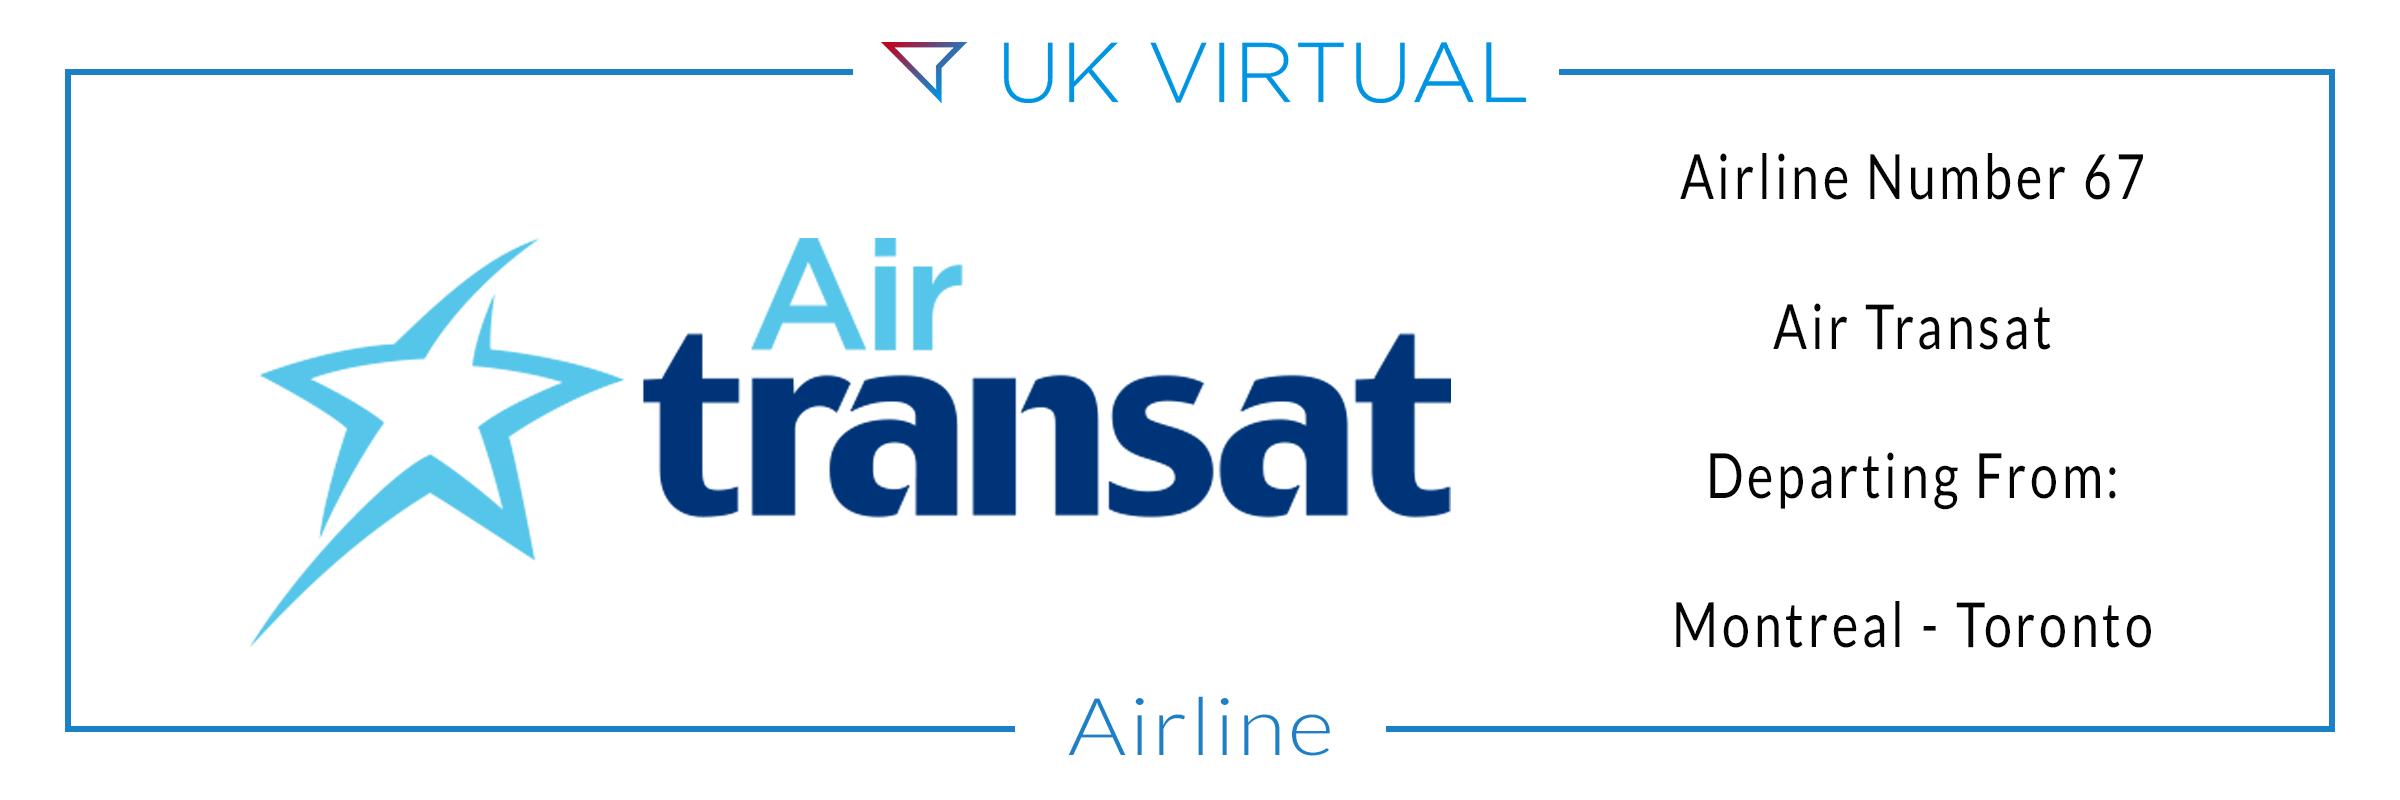 Airline Number 67: Air Transat